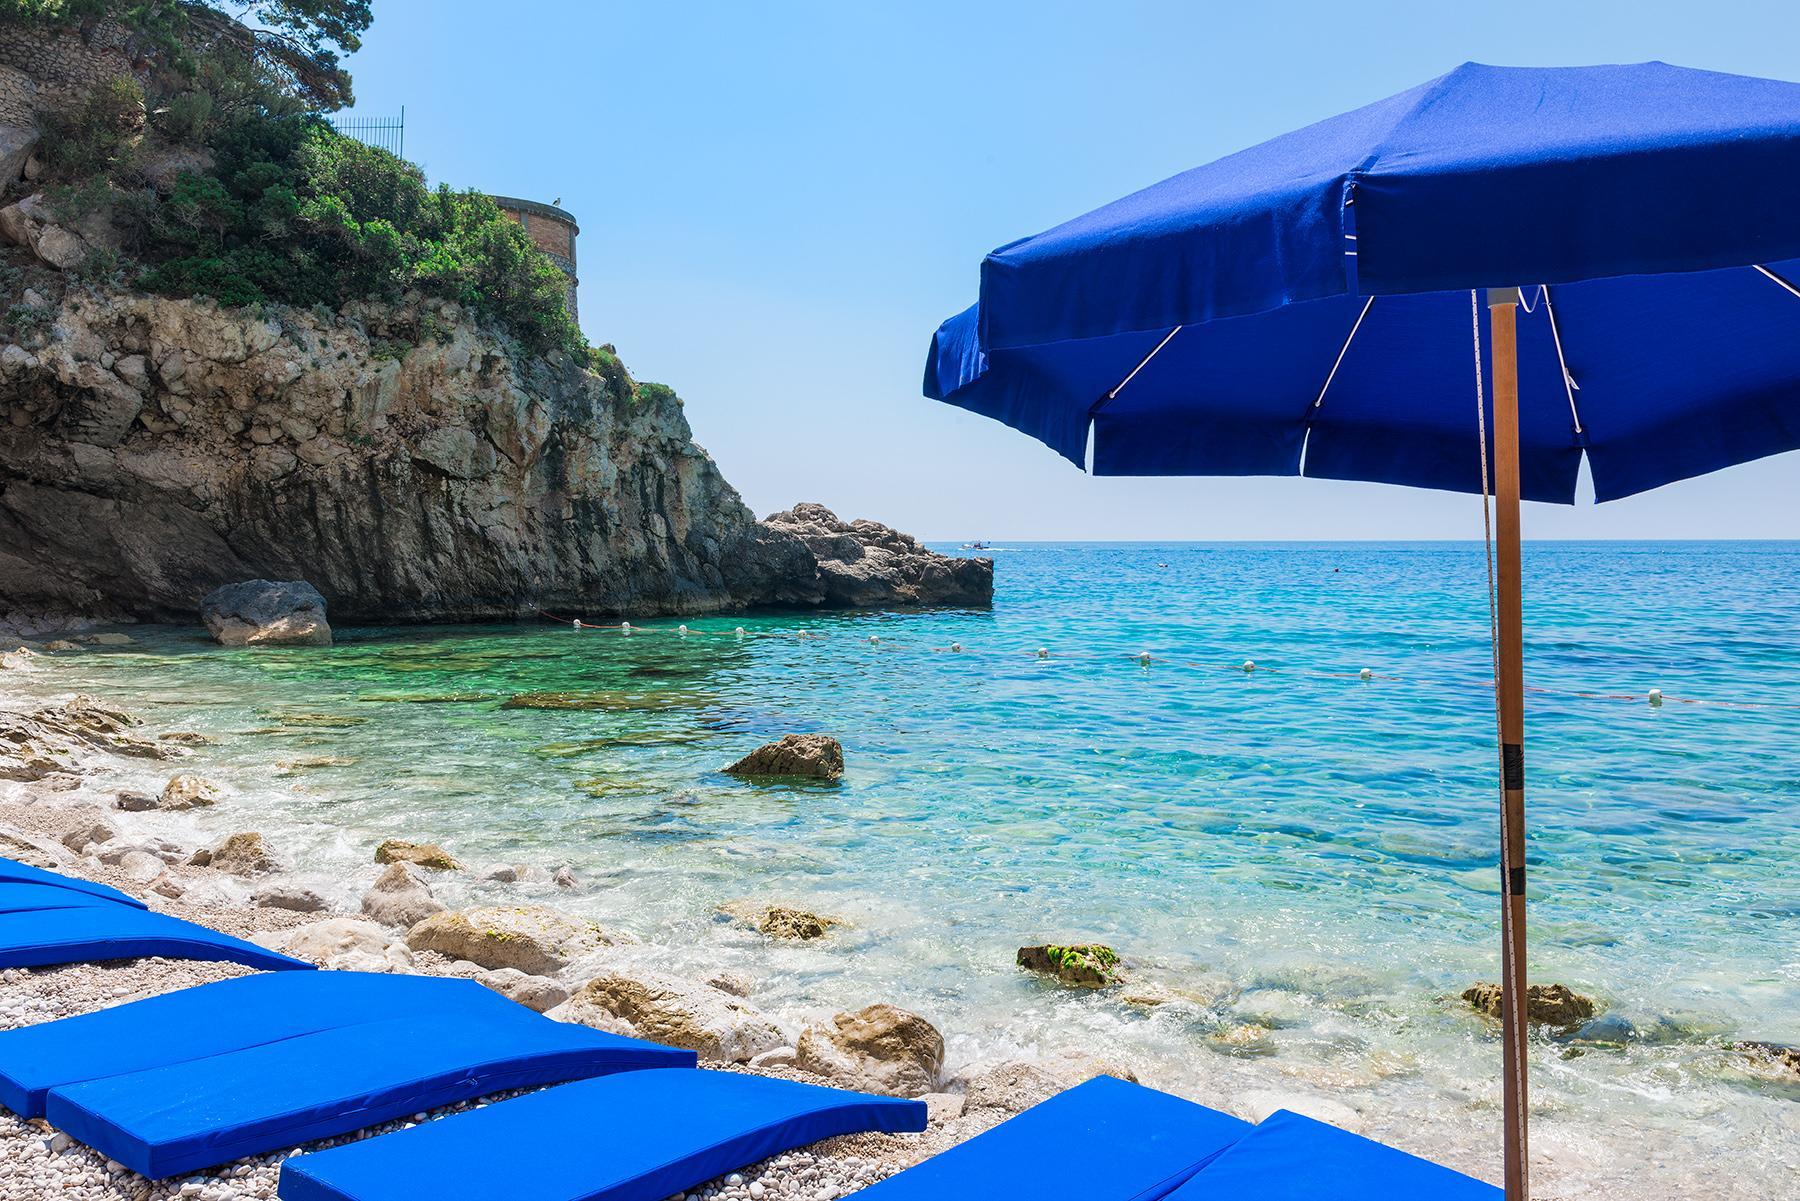 Villa Pieds dans l'eau in Capri - 18